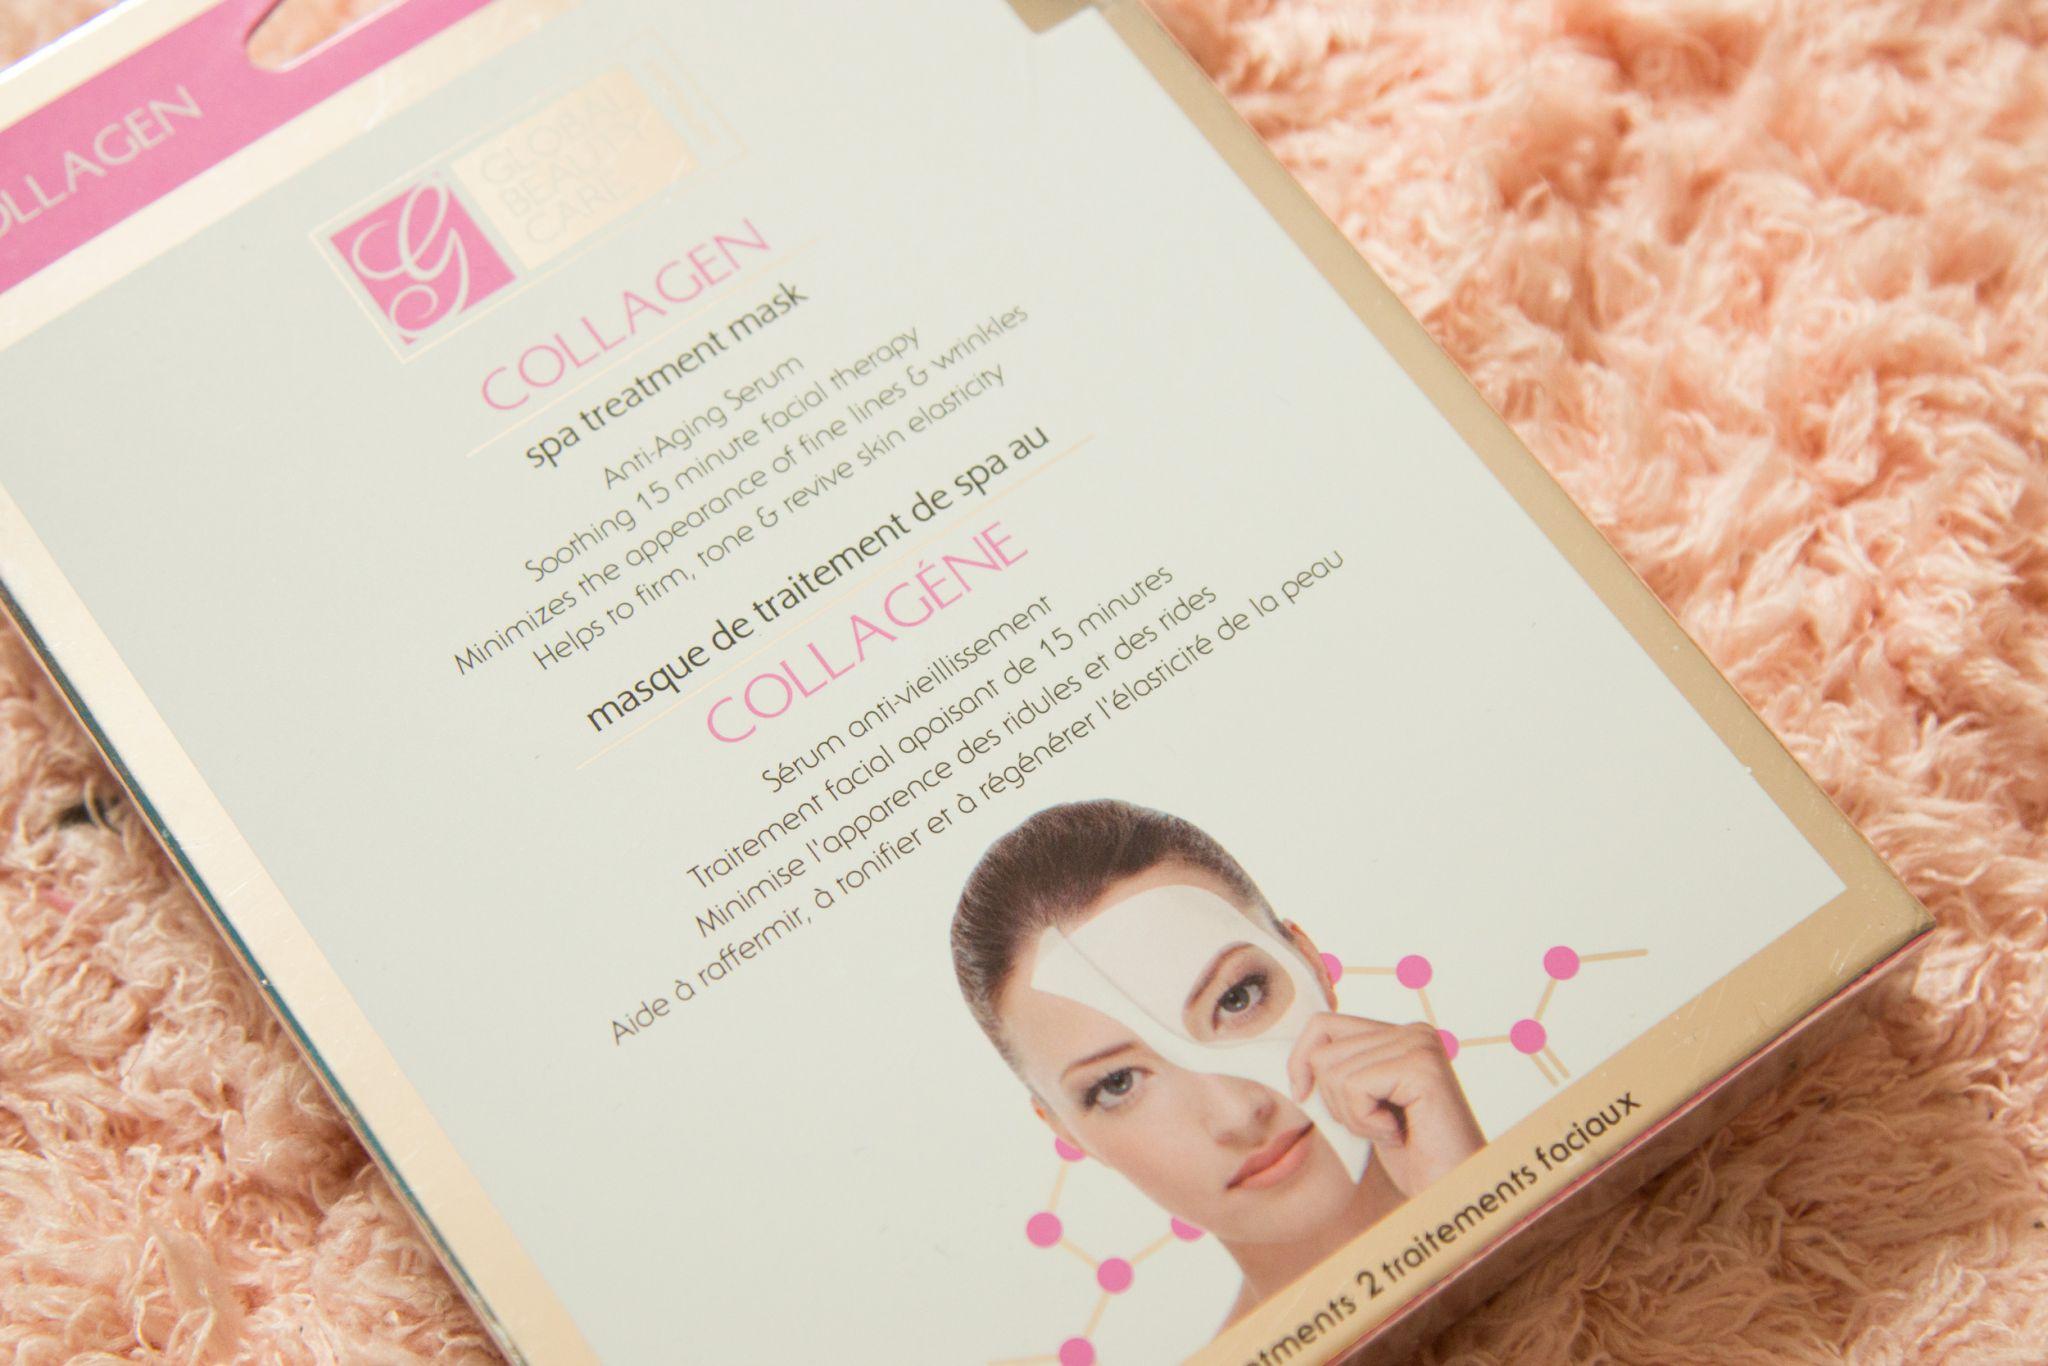 Global Beauty Care Cruelty Free Face Mask Dolar Tree